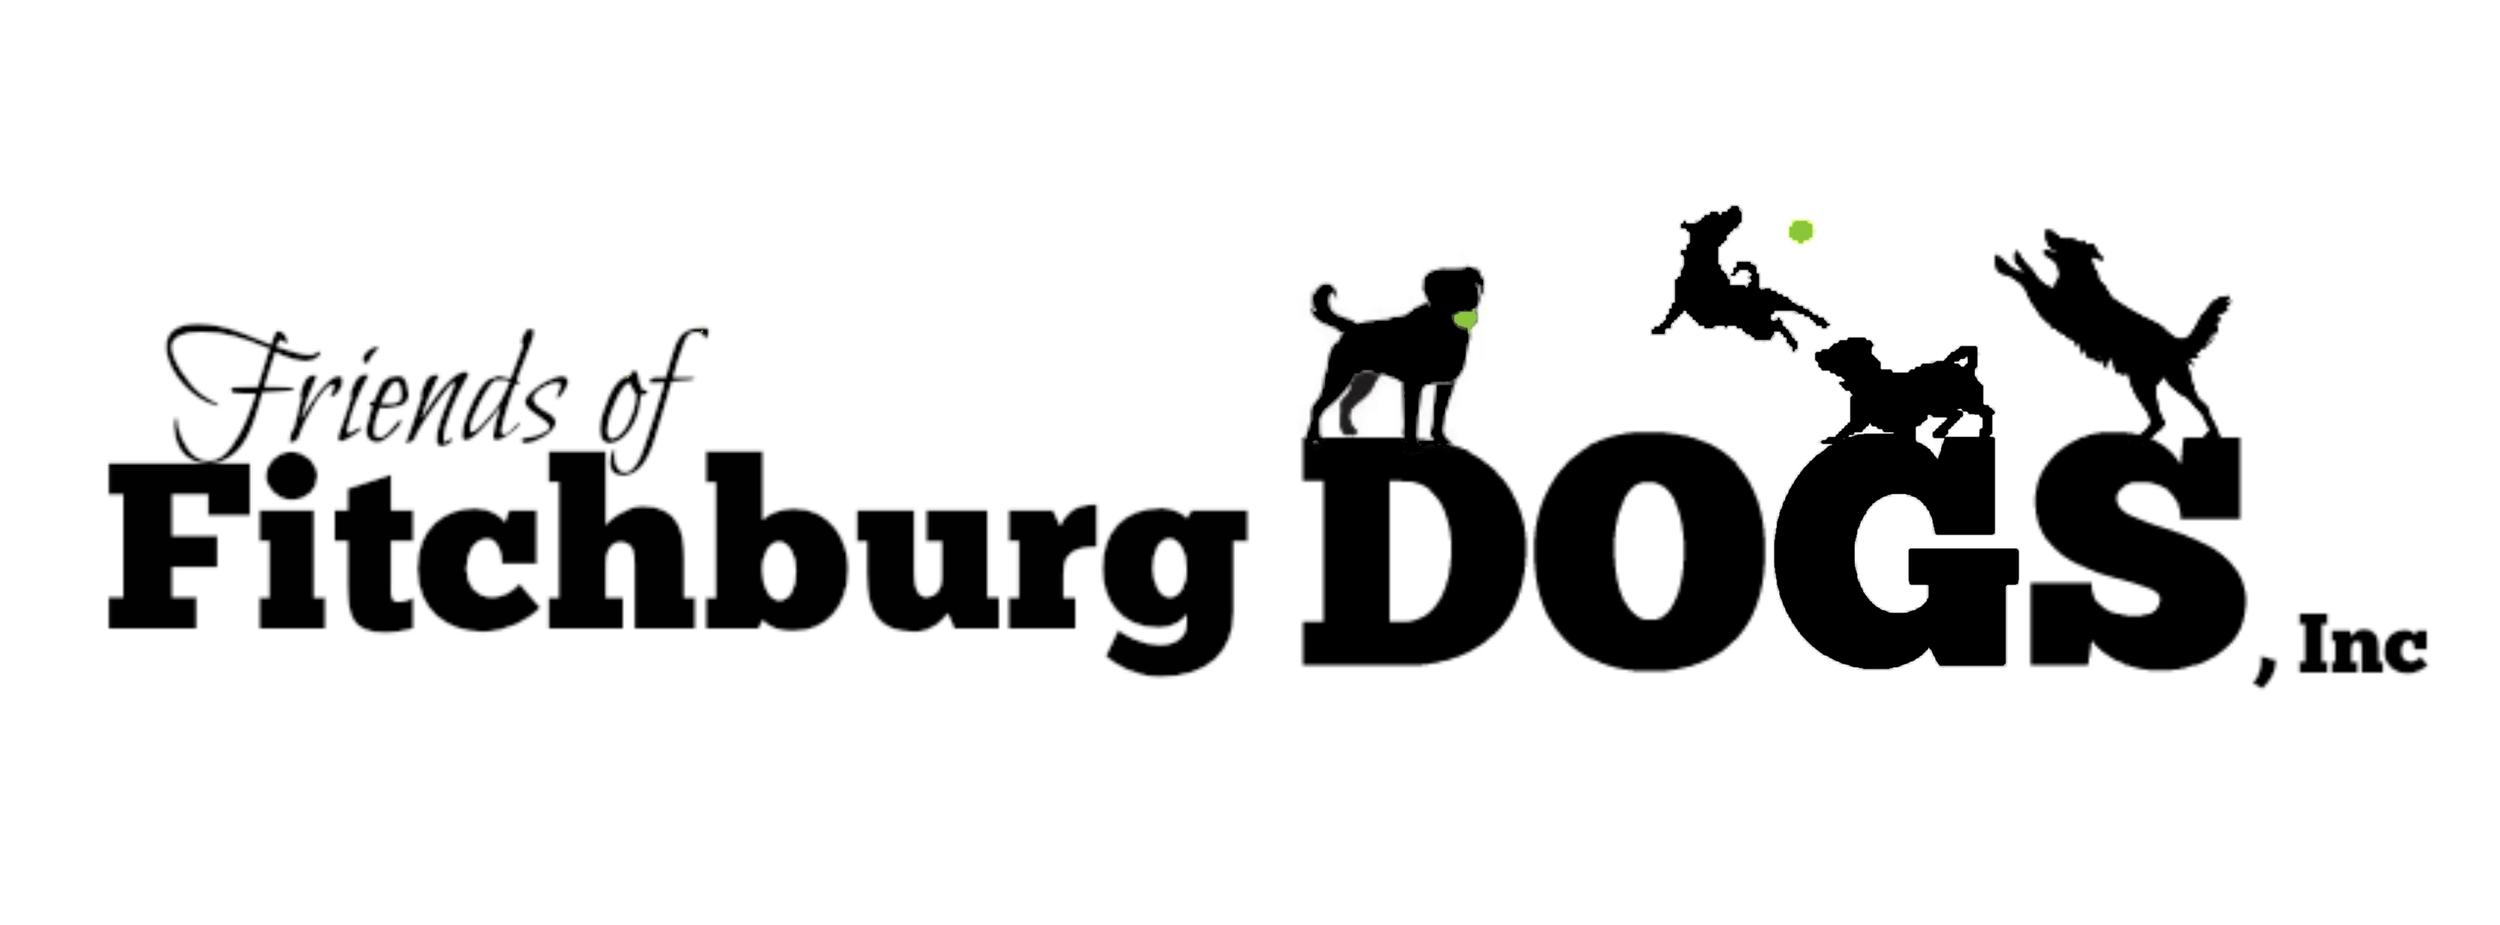 friends of fitchburg dogs inc long logo.jpg